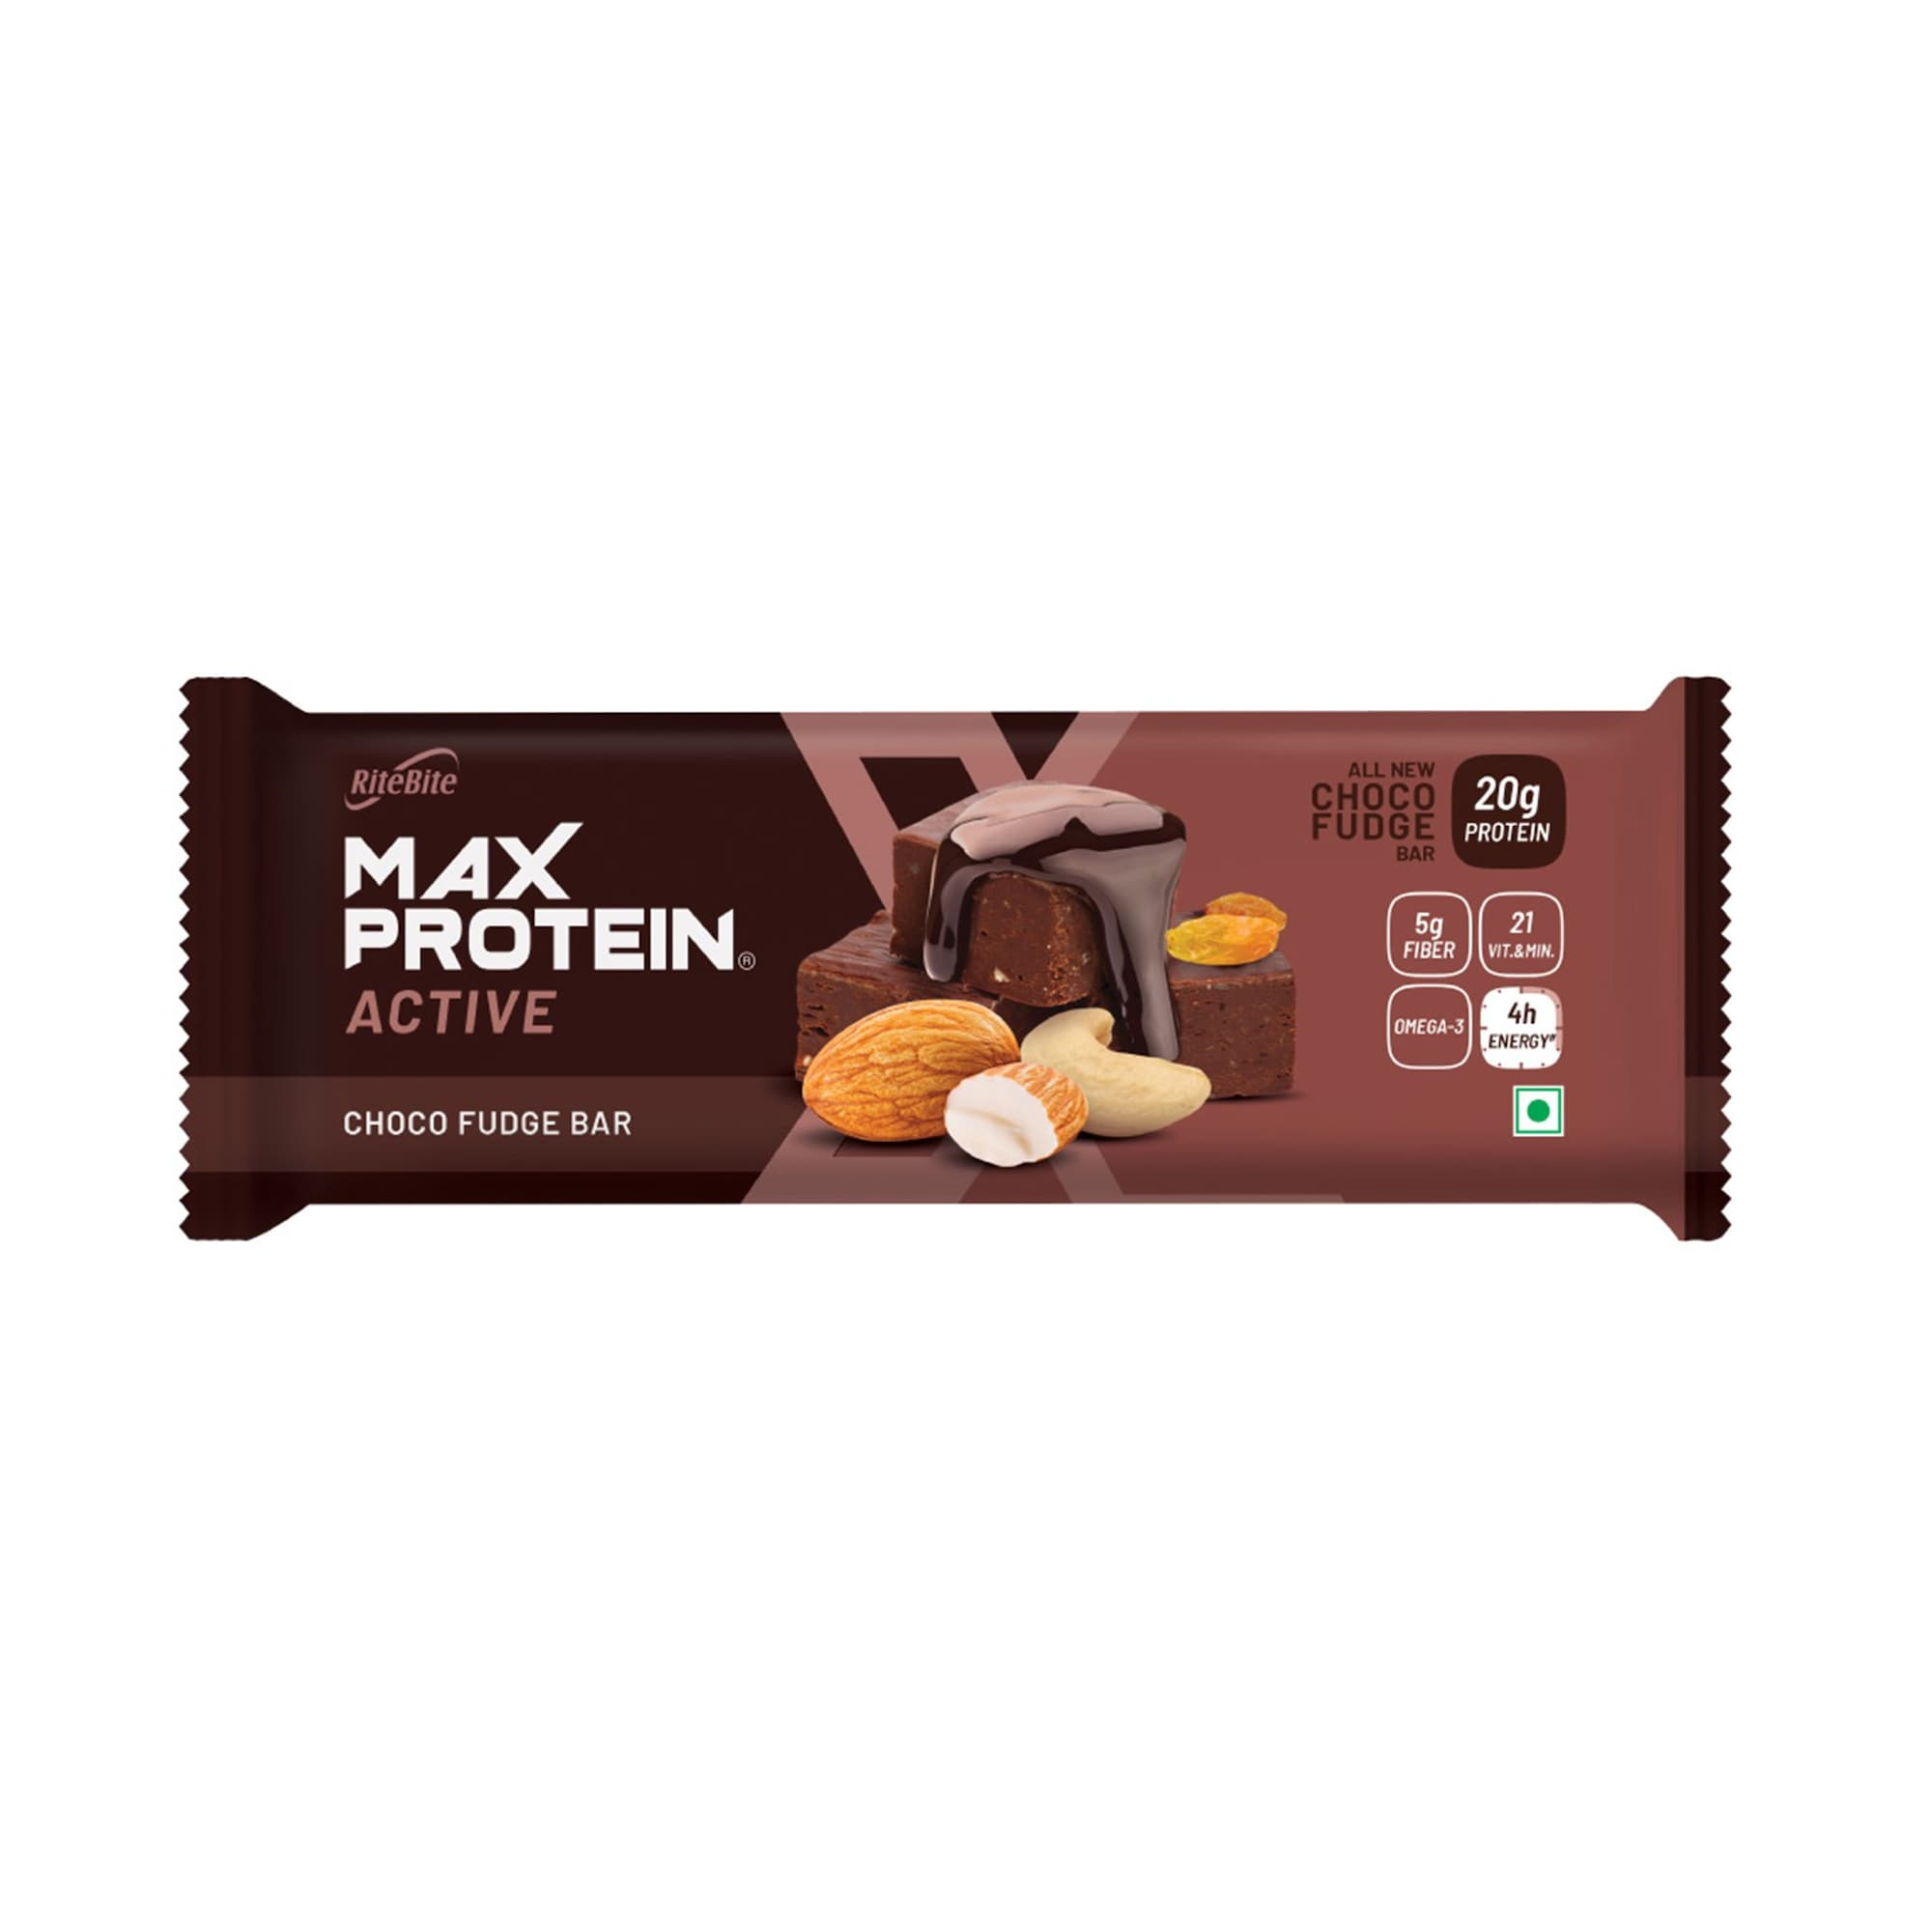 RiteBite Max Protein Active Choco Fudge Bar, 75 gm